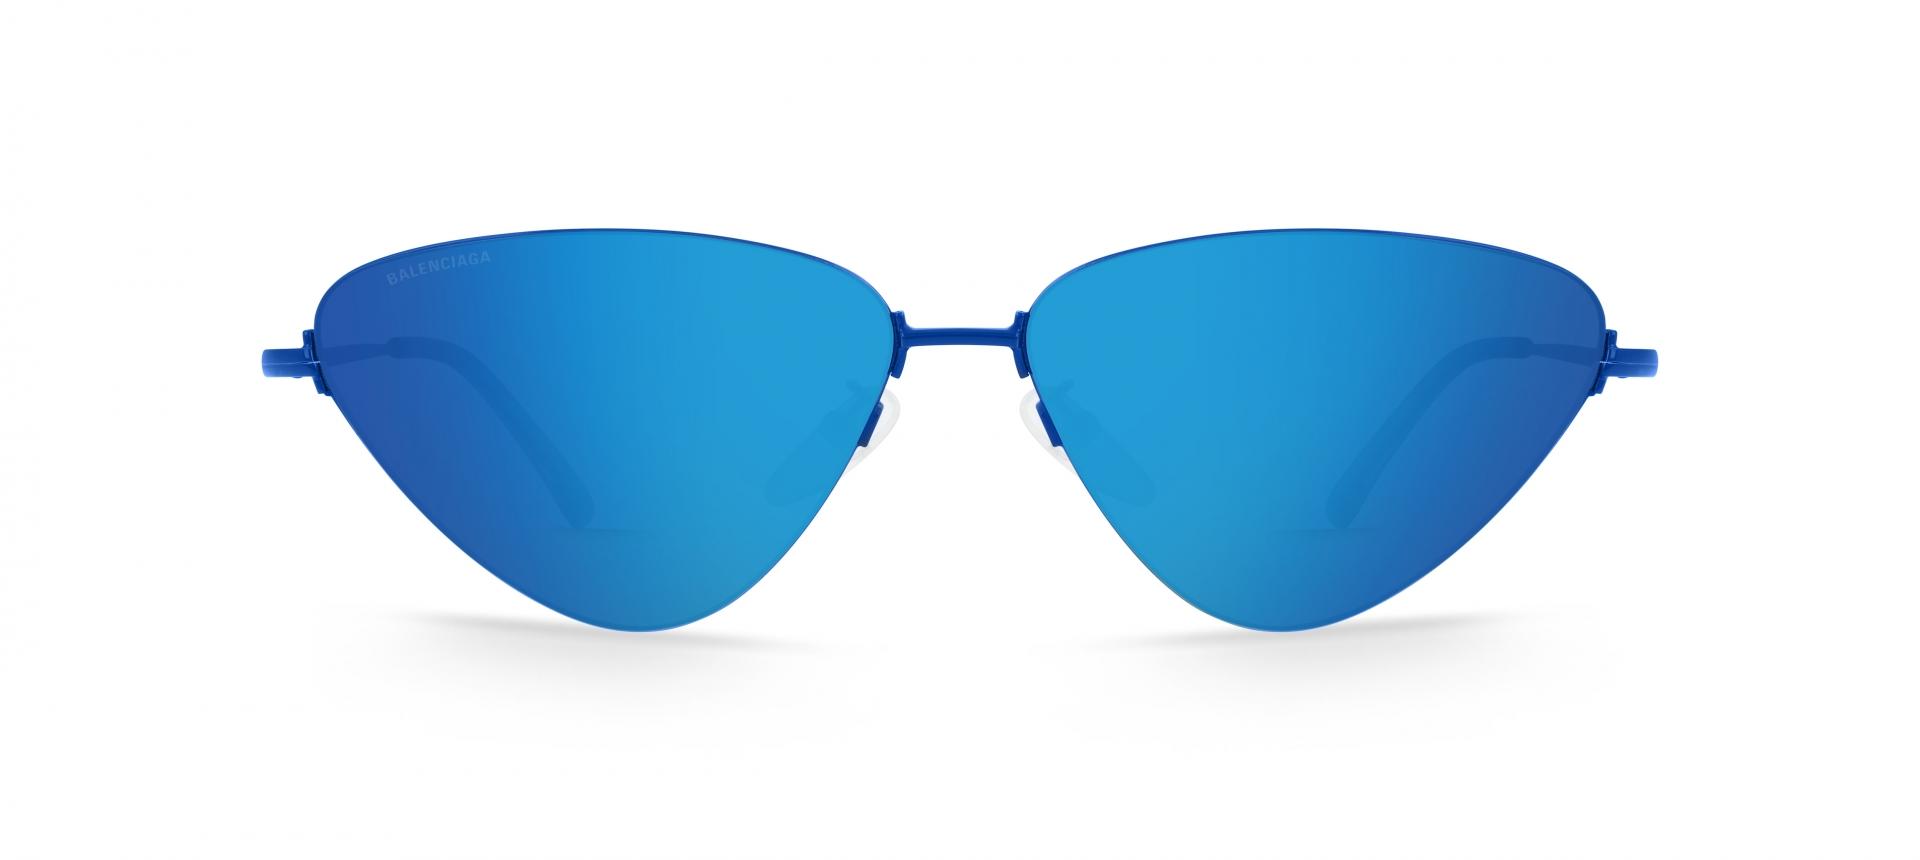 c36c0554d152a Kering Eyewear - Home